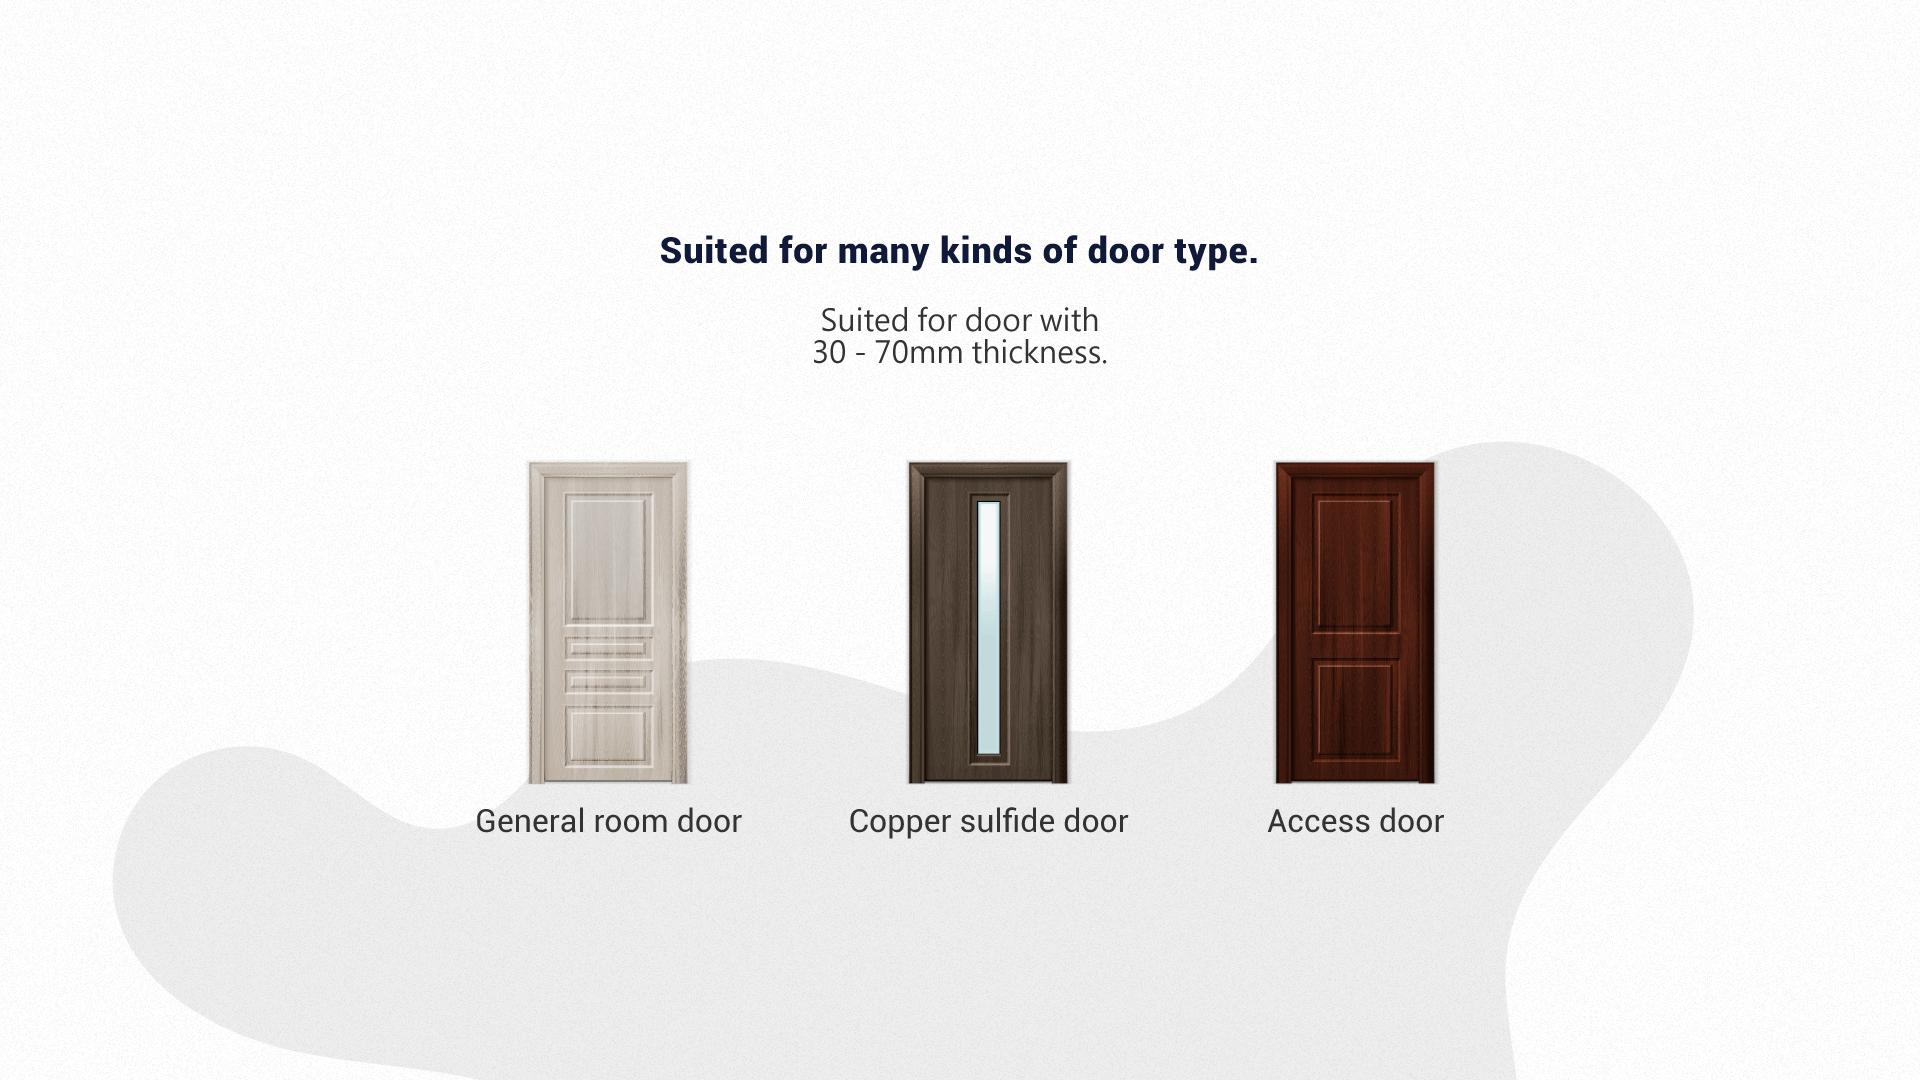 No Key hole design, Anti-theft.